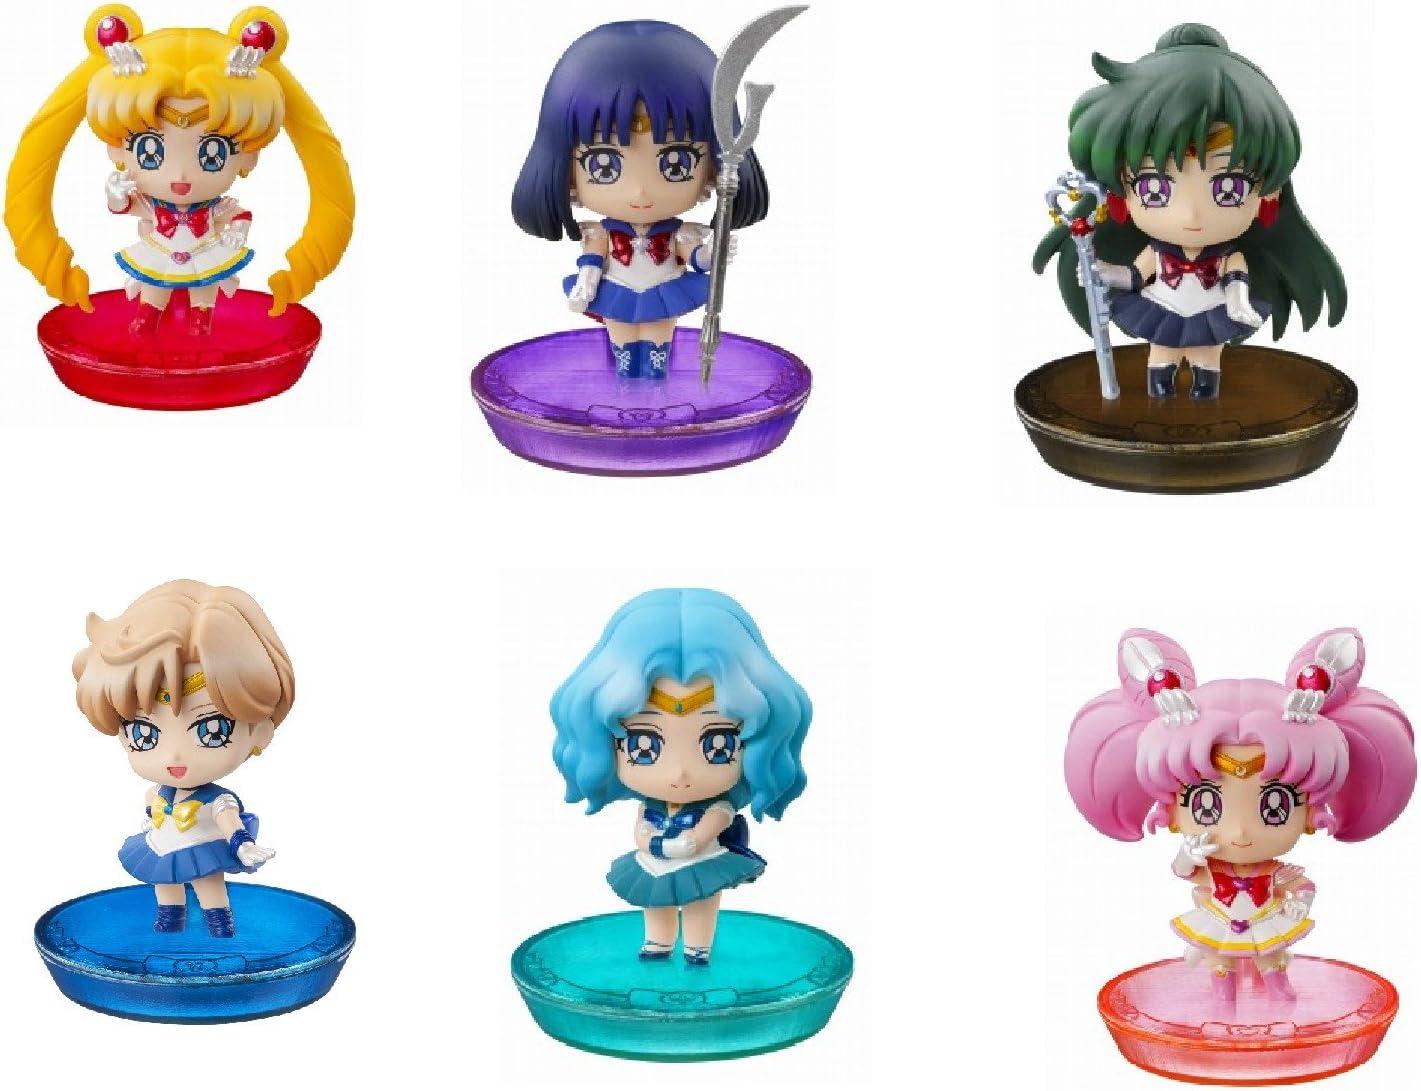 NEW Petit Chara Sailor Moon Christmas Special Box Vol.1 /& Warrior Edition Japan